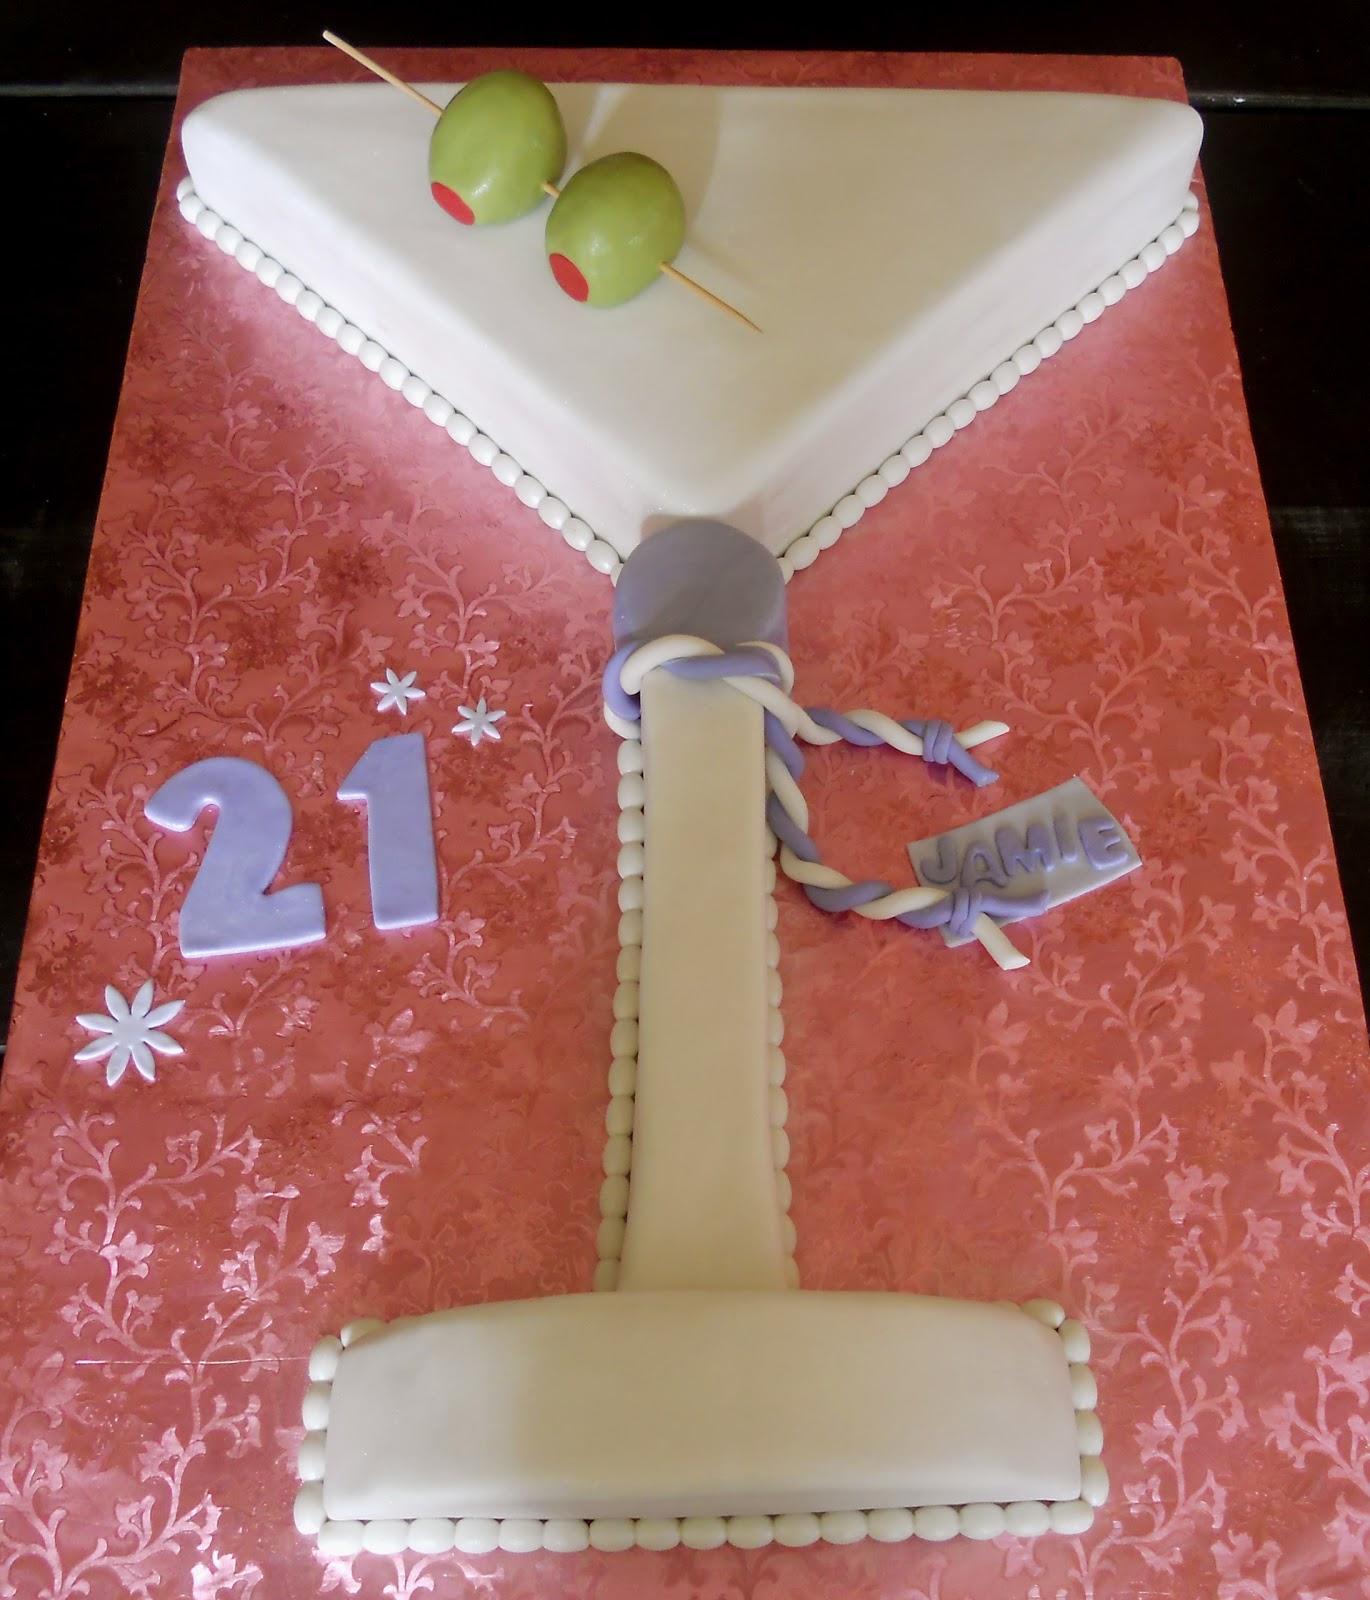 Astonishing 8 Martini Glass Shaped Cakes Photo Martini Glass Cupcake Cake Funny Birthday Cards Online Benoljebrpdamsfinfo